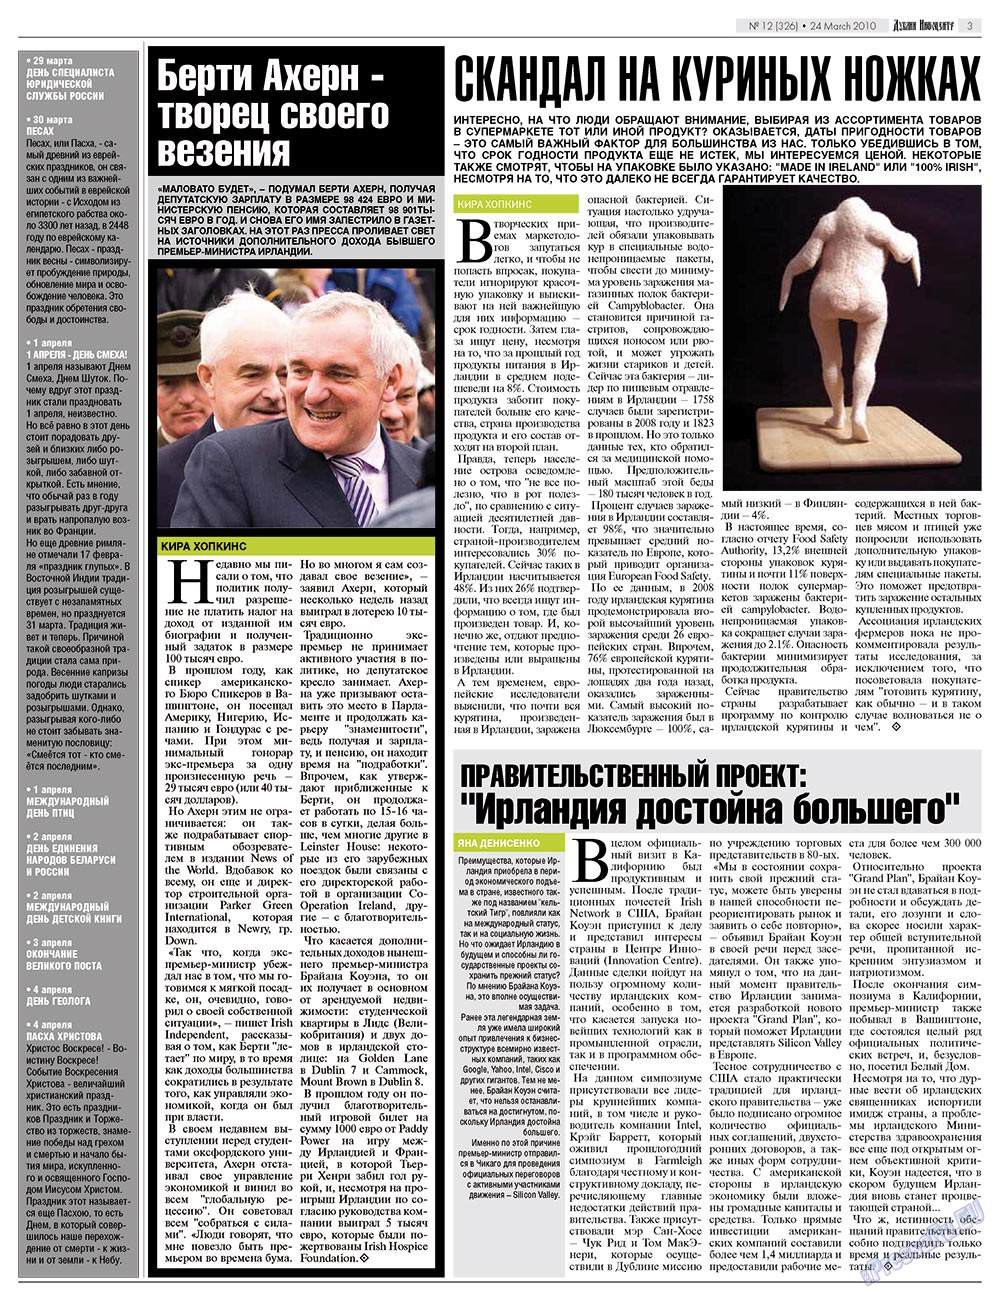 Дублин инфоцентр (газета). 2010 год, номер 12, стр. 3